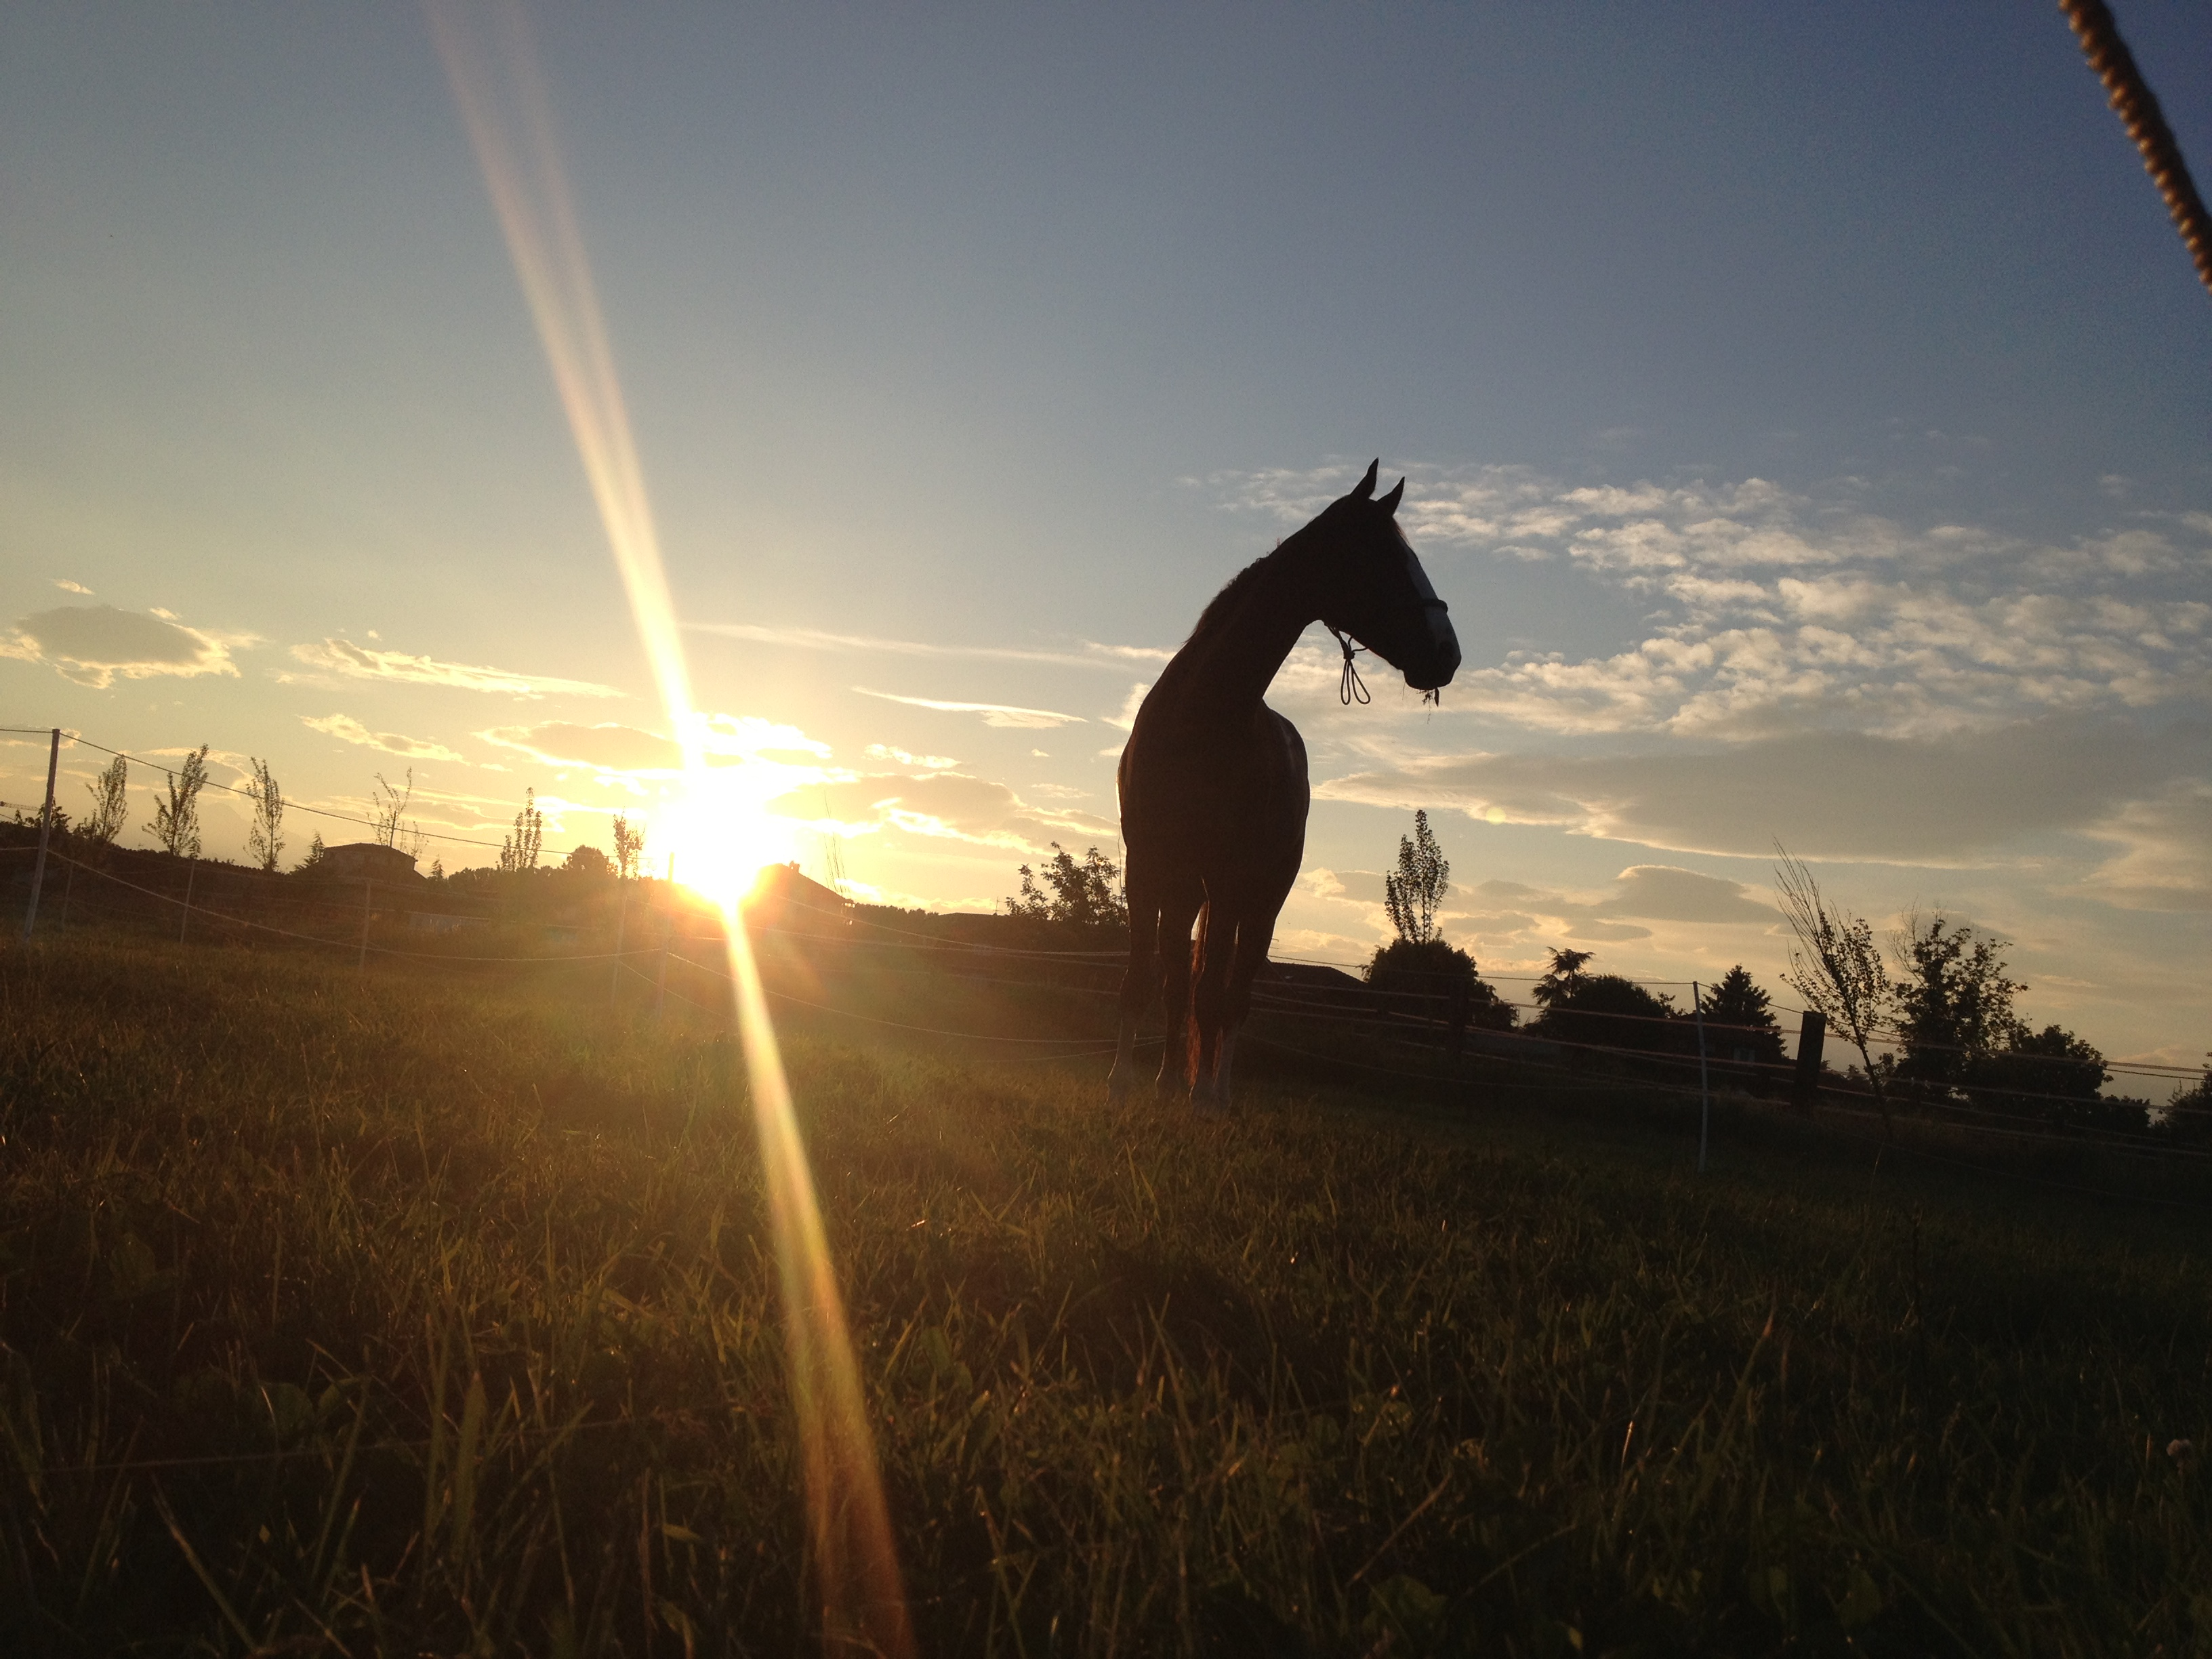 Marnet equestrian